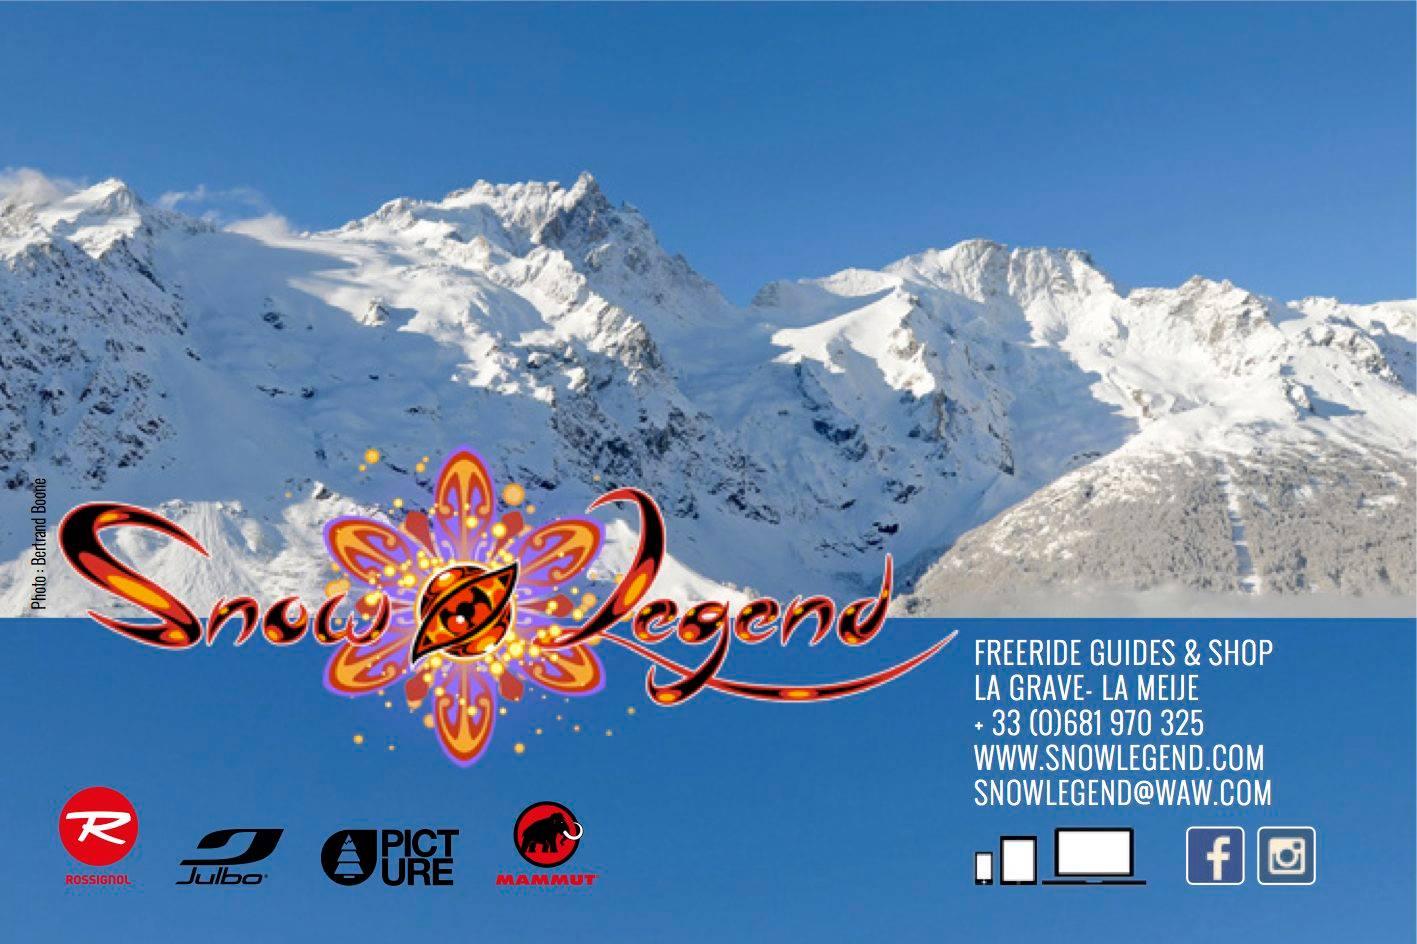 Stages de Ski / Snowboard freeride, Randonnée, Splitboard avec SnowLegend (9)